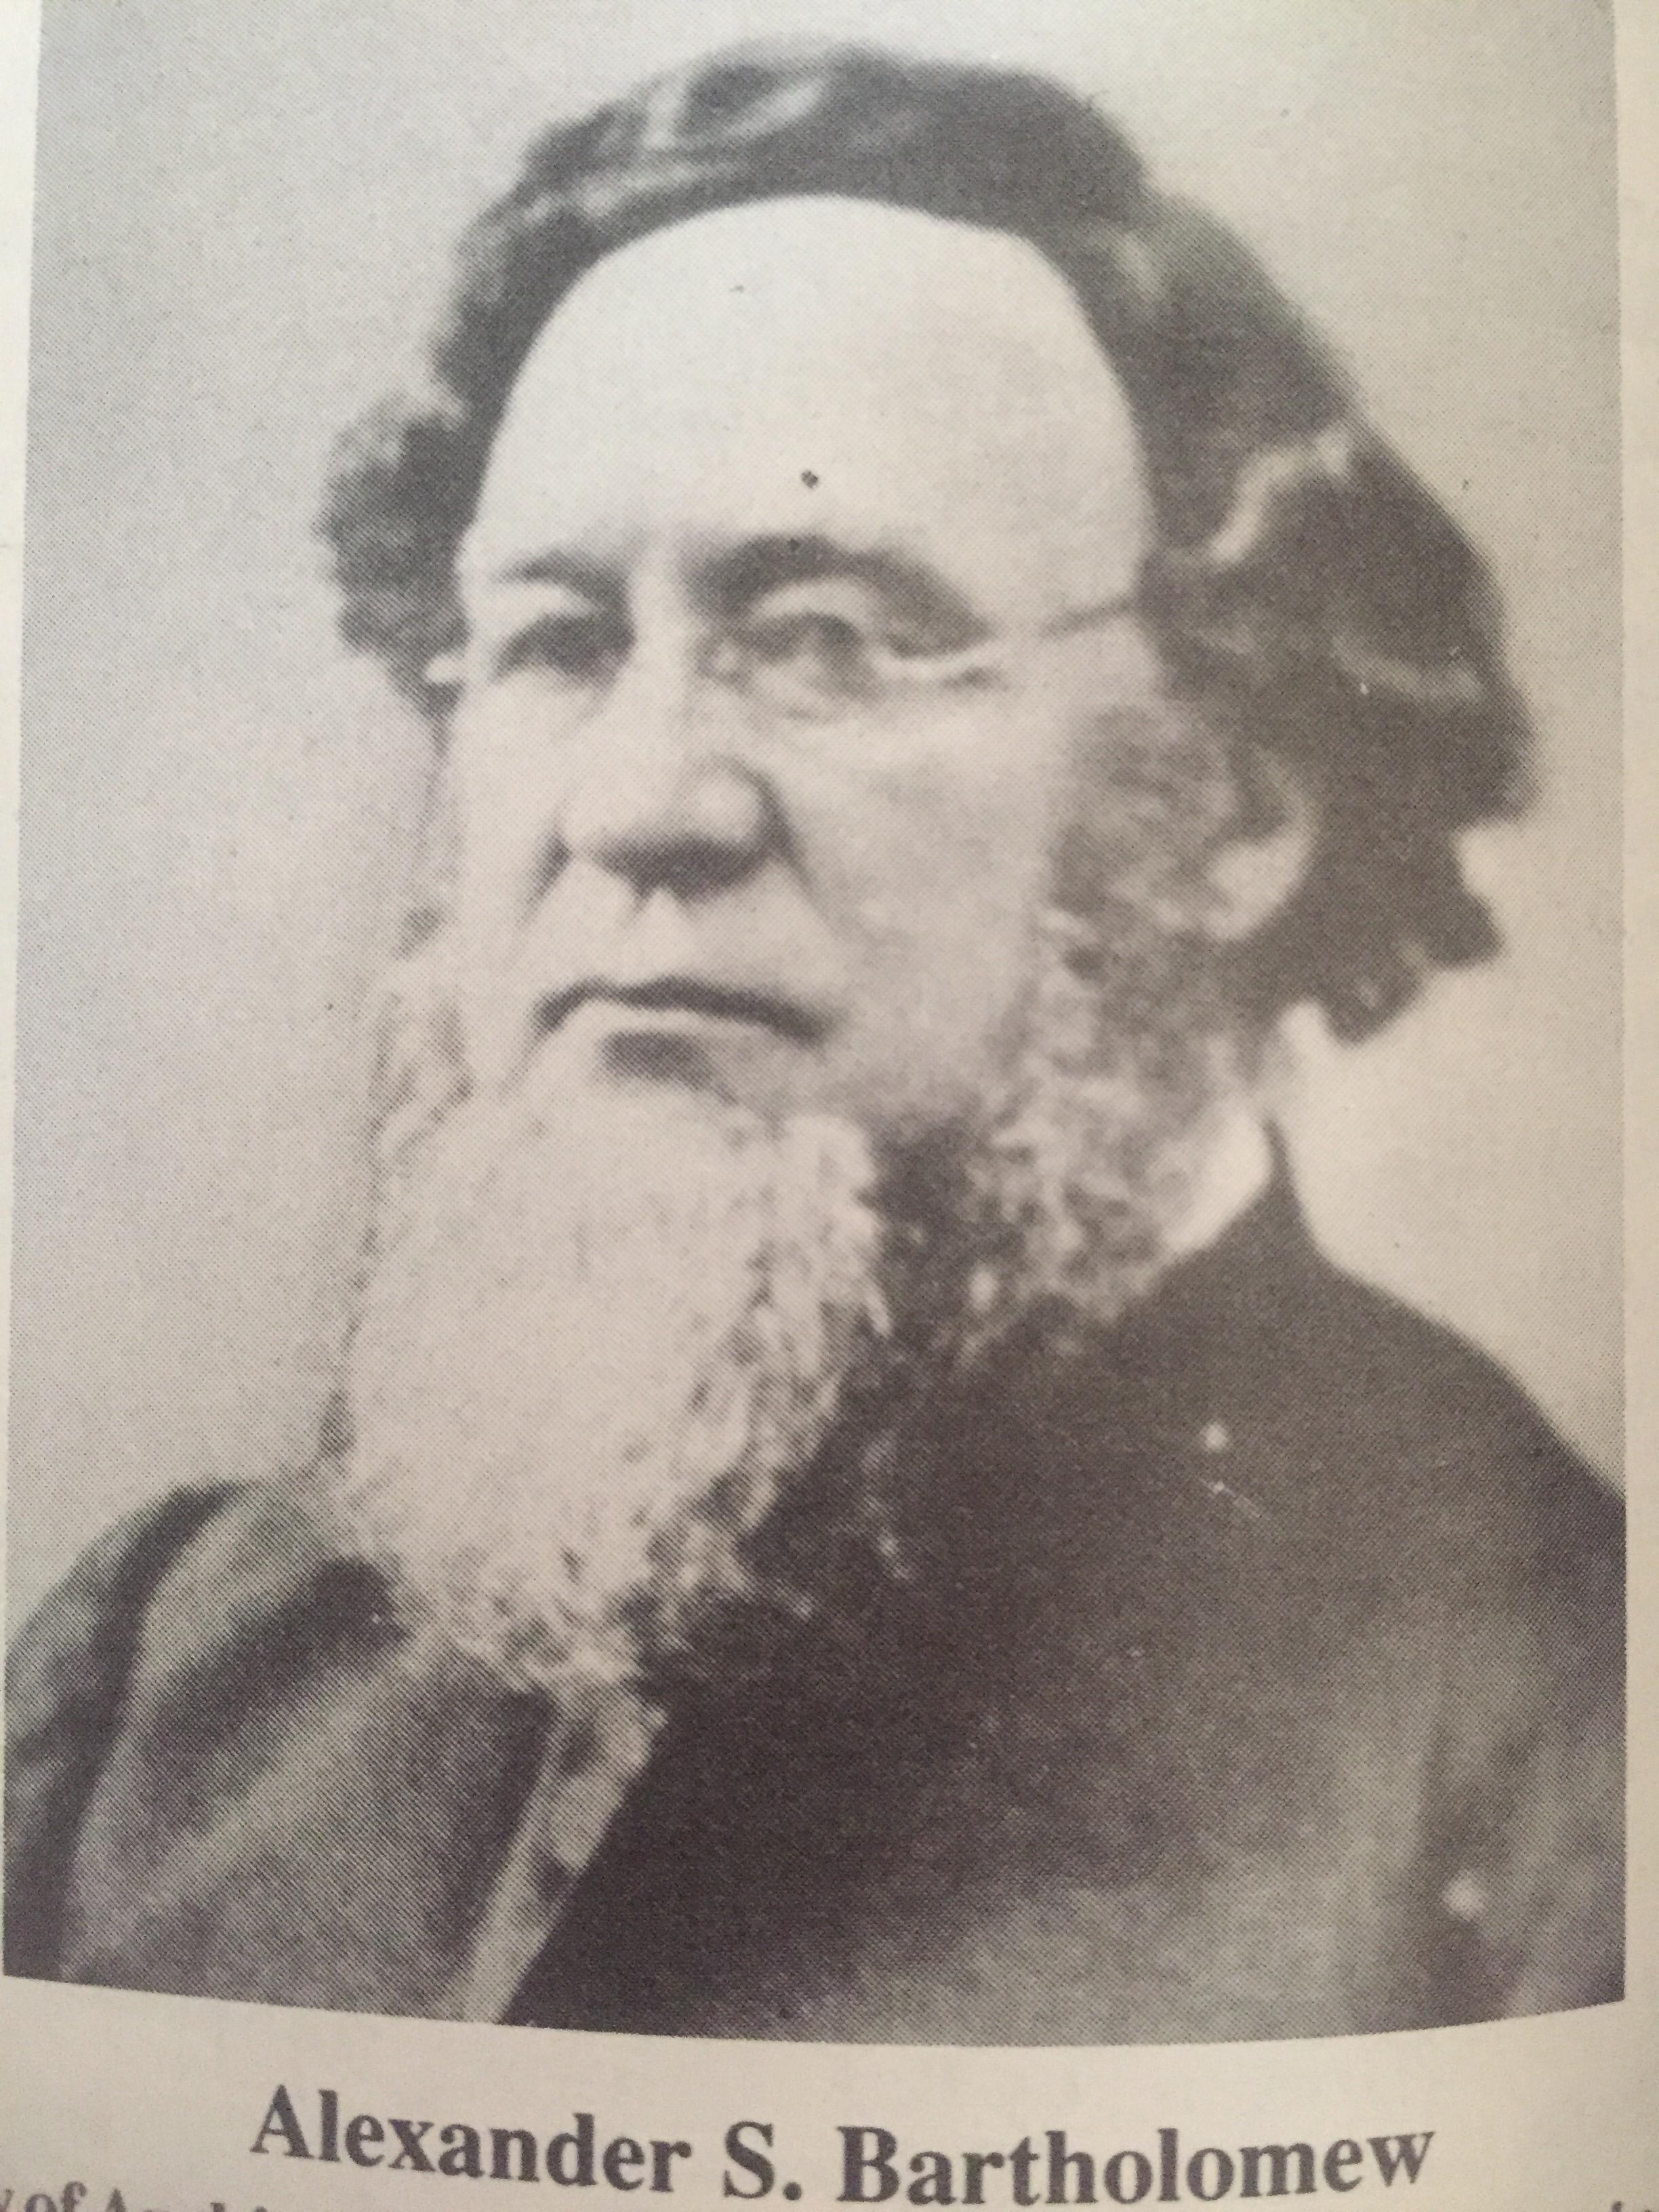 Rev A. S. Bartholomew